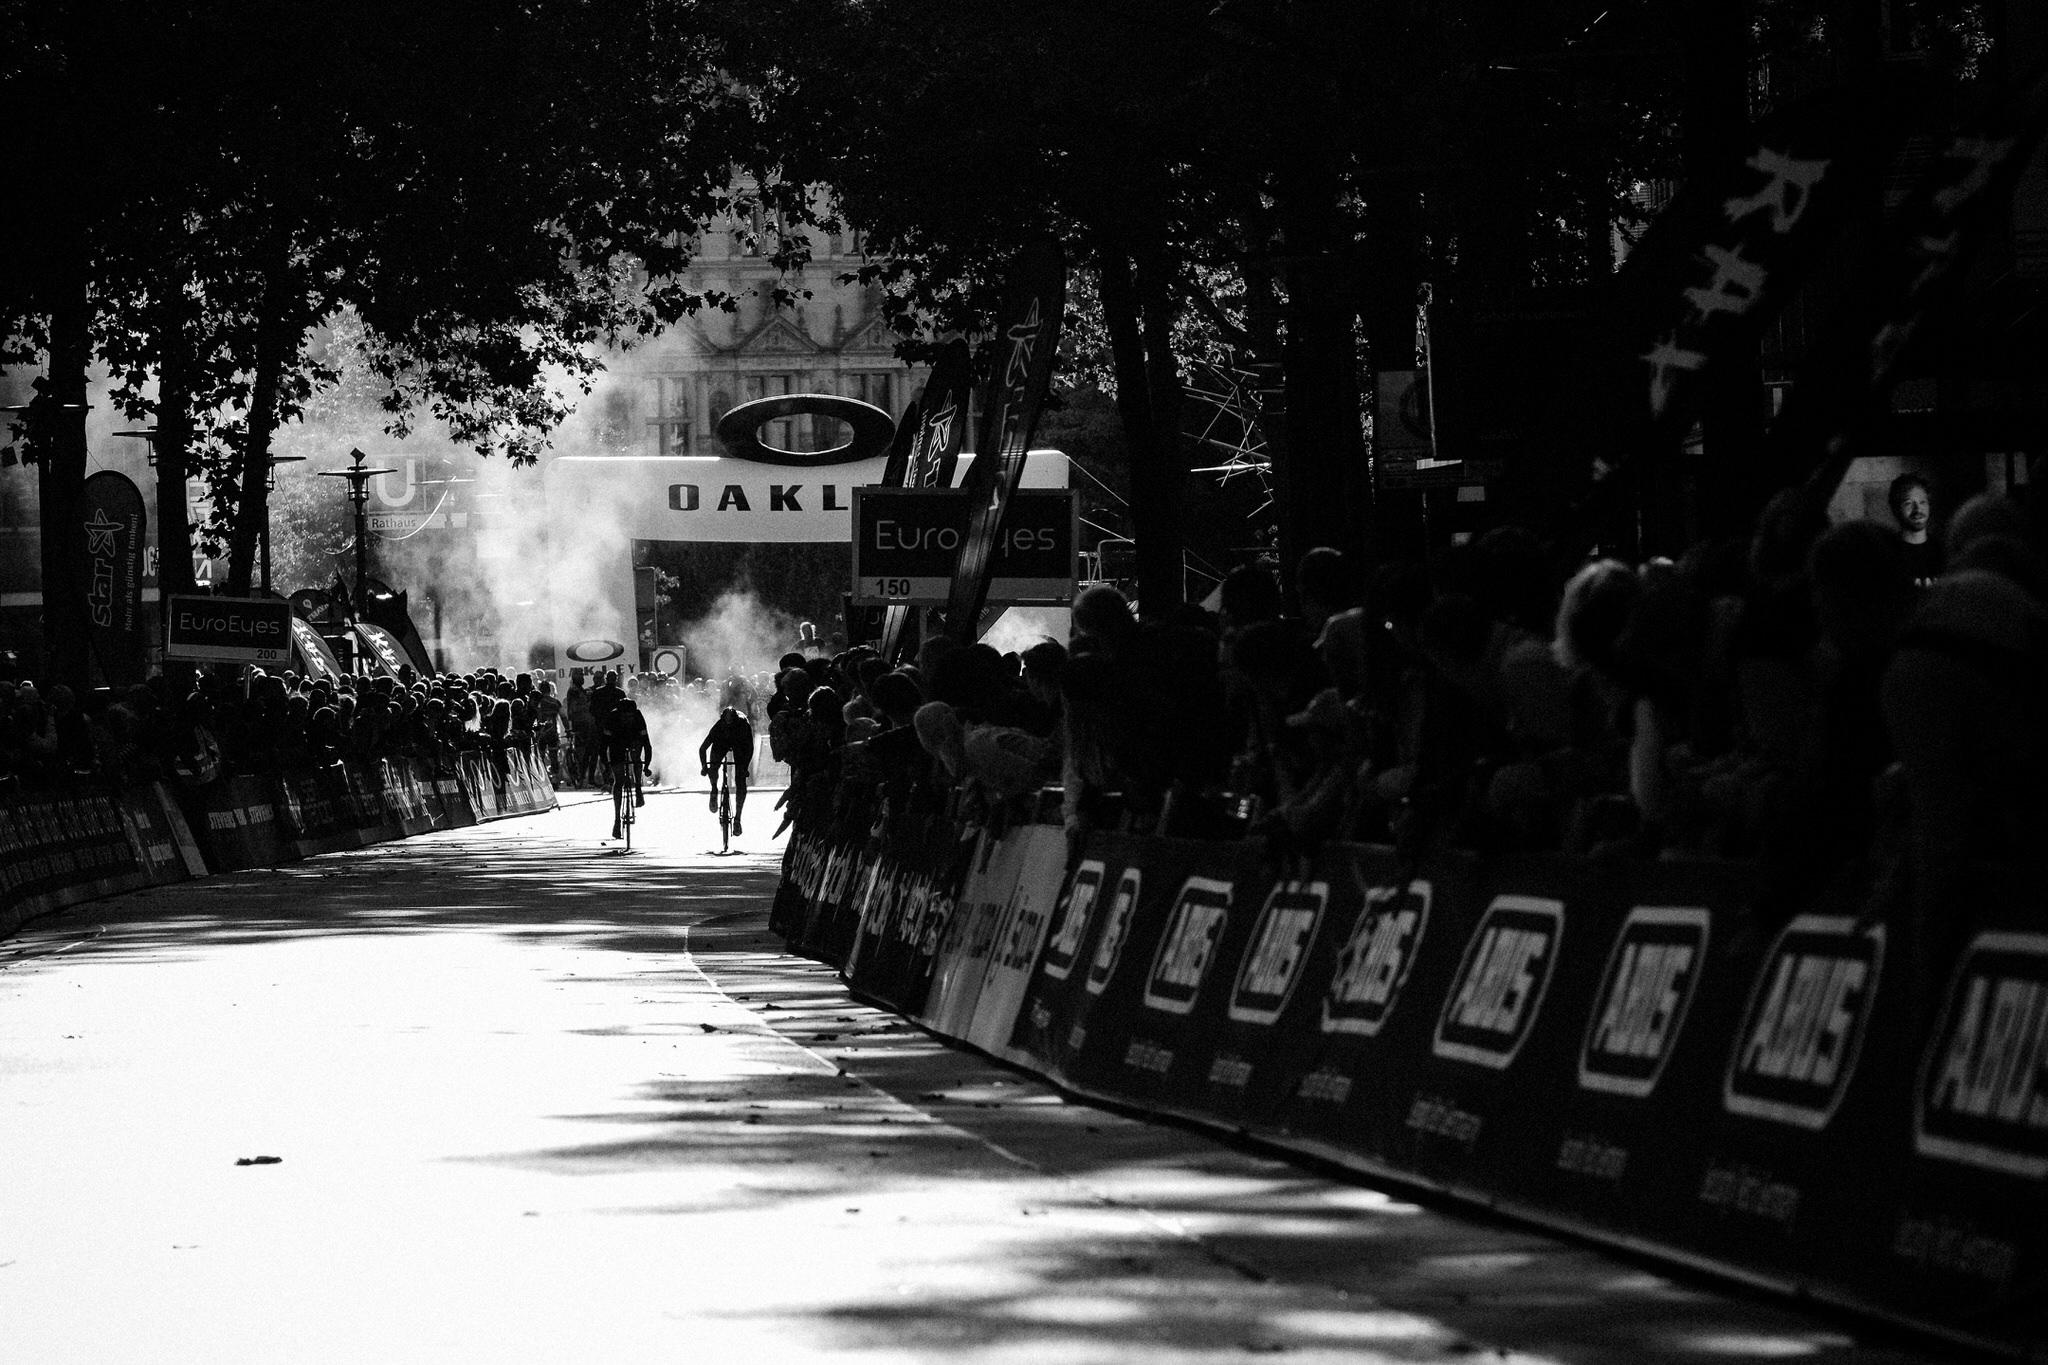 RAD-RACE_BATTLE_Cyclassics_2017_Photo by Björn Lexius_15.jpg